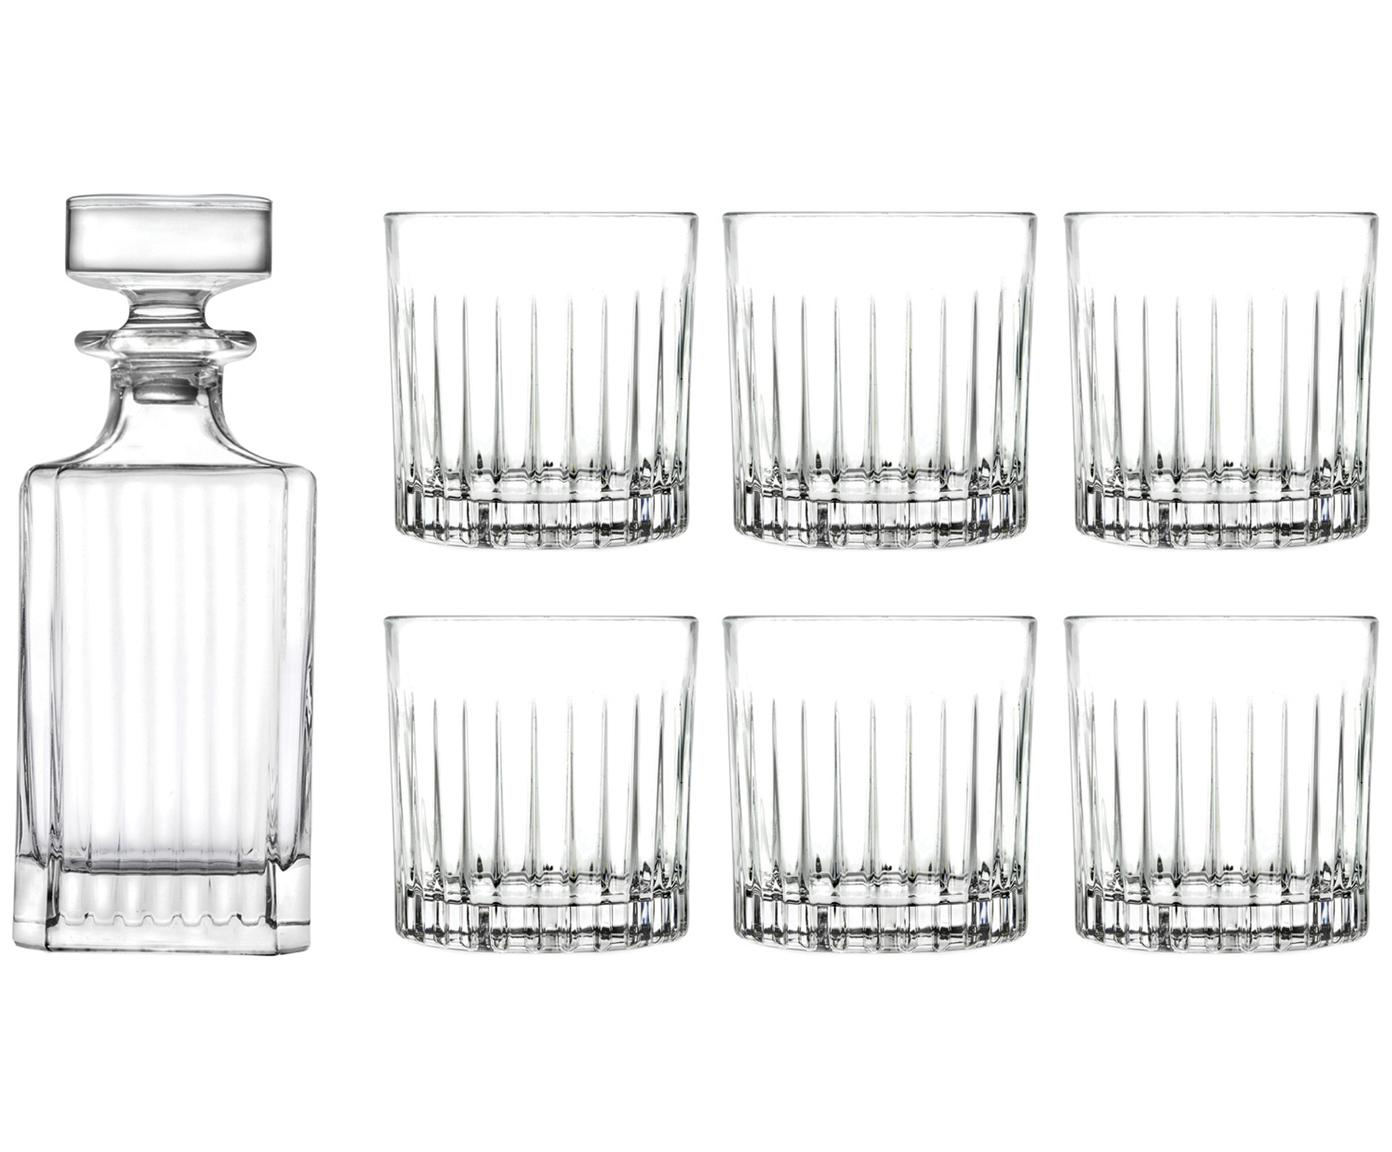 Kristallen wiskeyset Timeless, 7-delig, Kristalglas, Transparant, Verschillende formaten